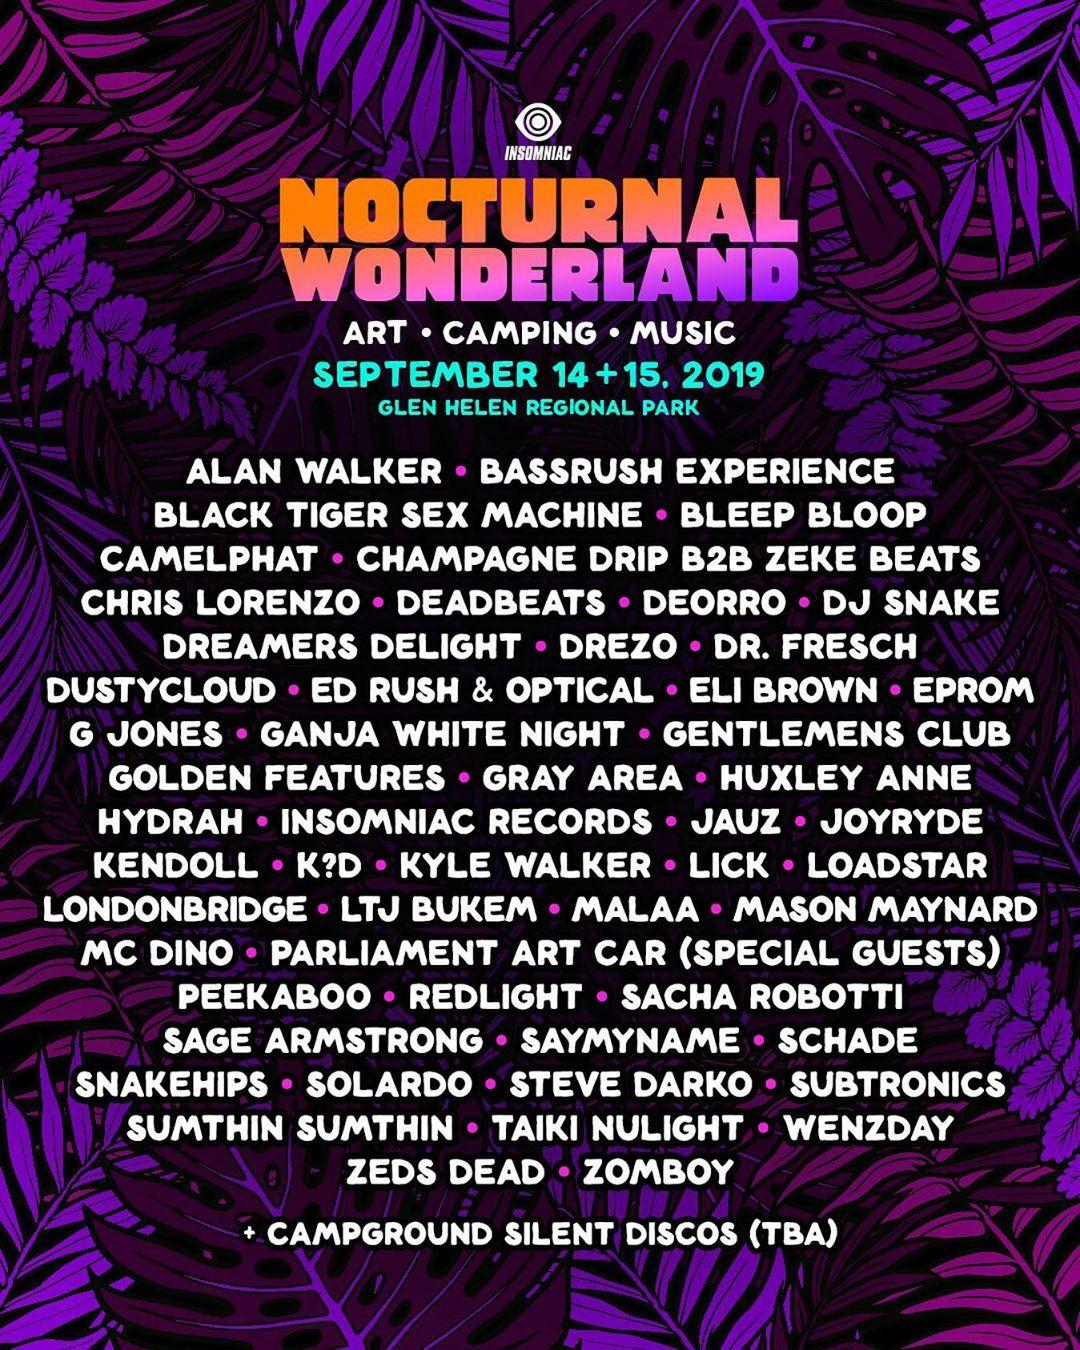 Nocturnal Wonderland 2019 Lineup